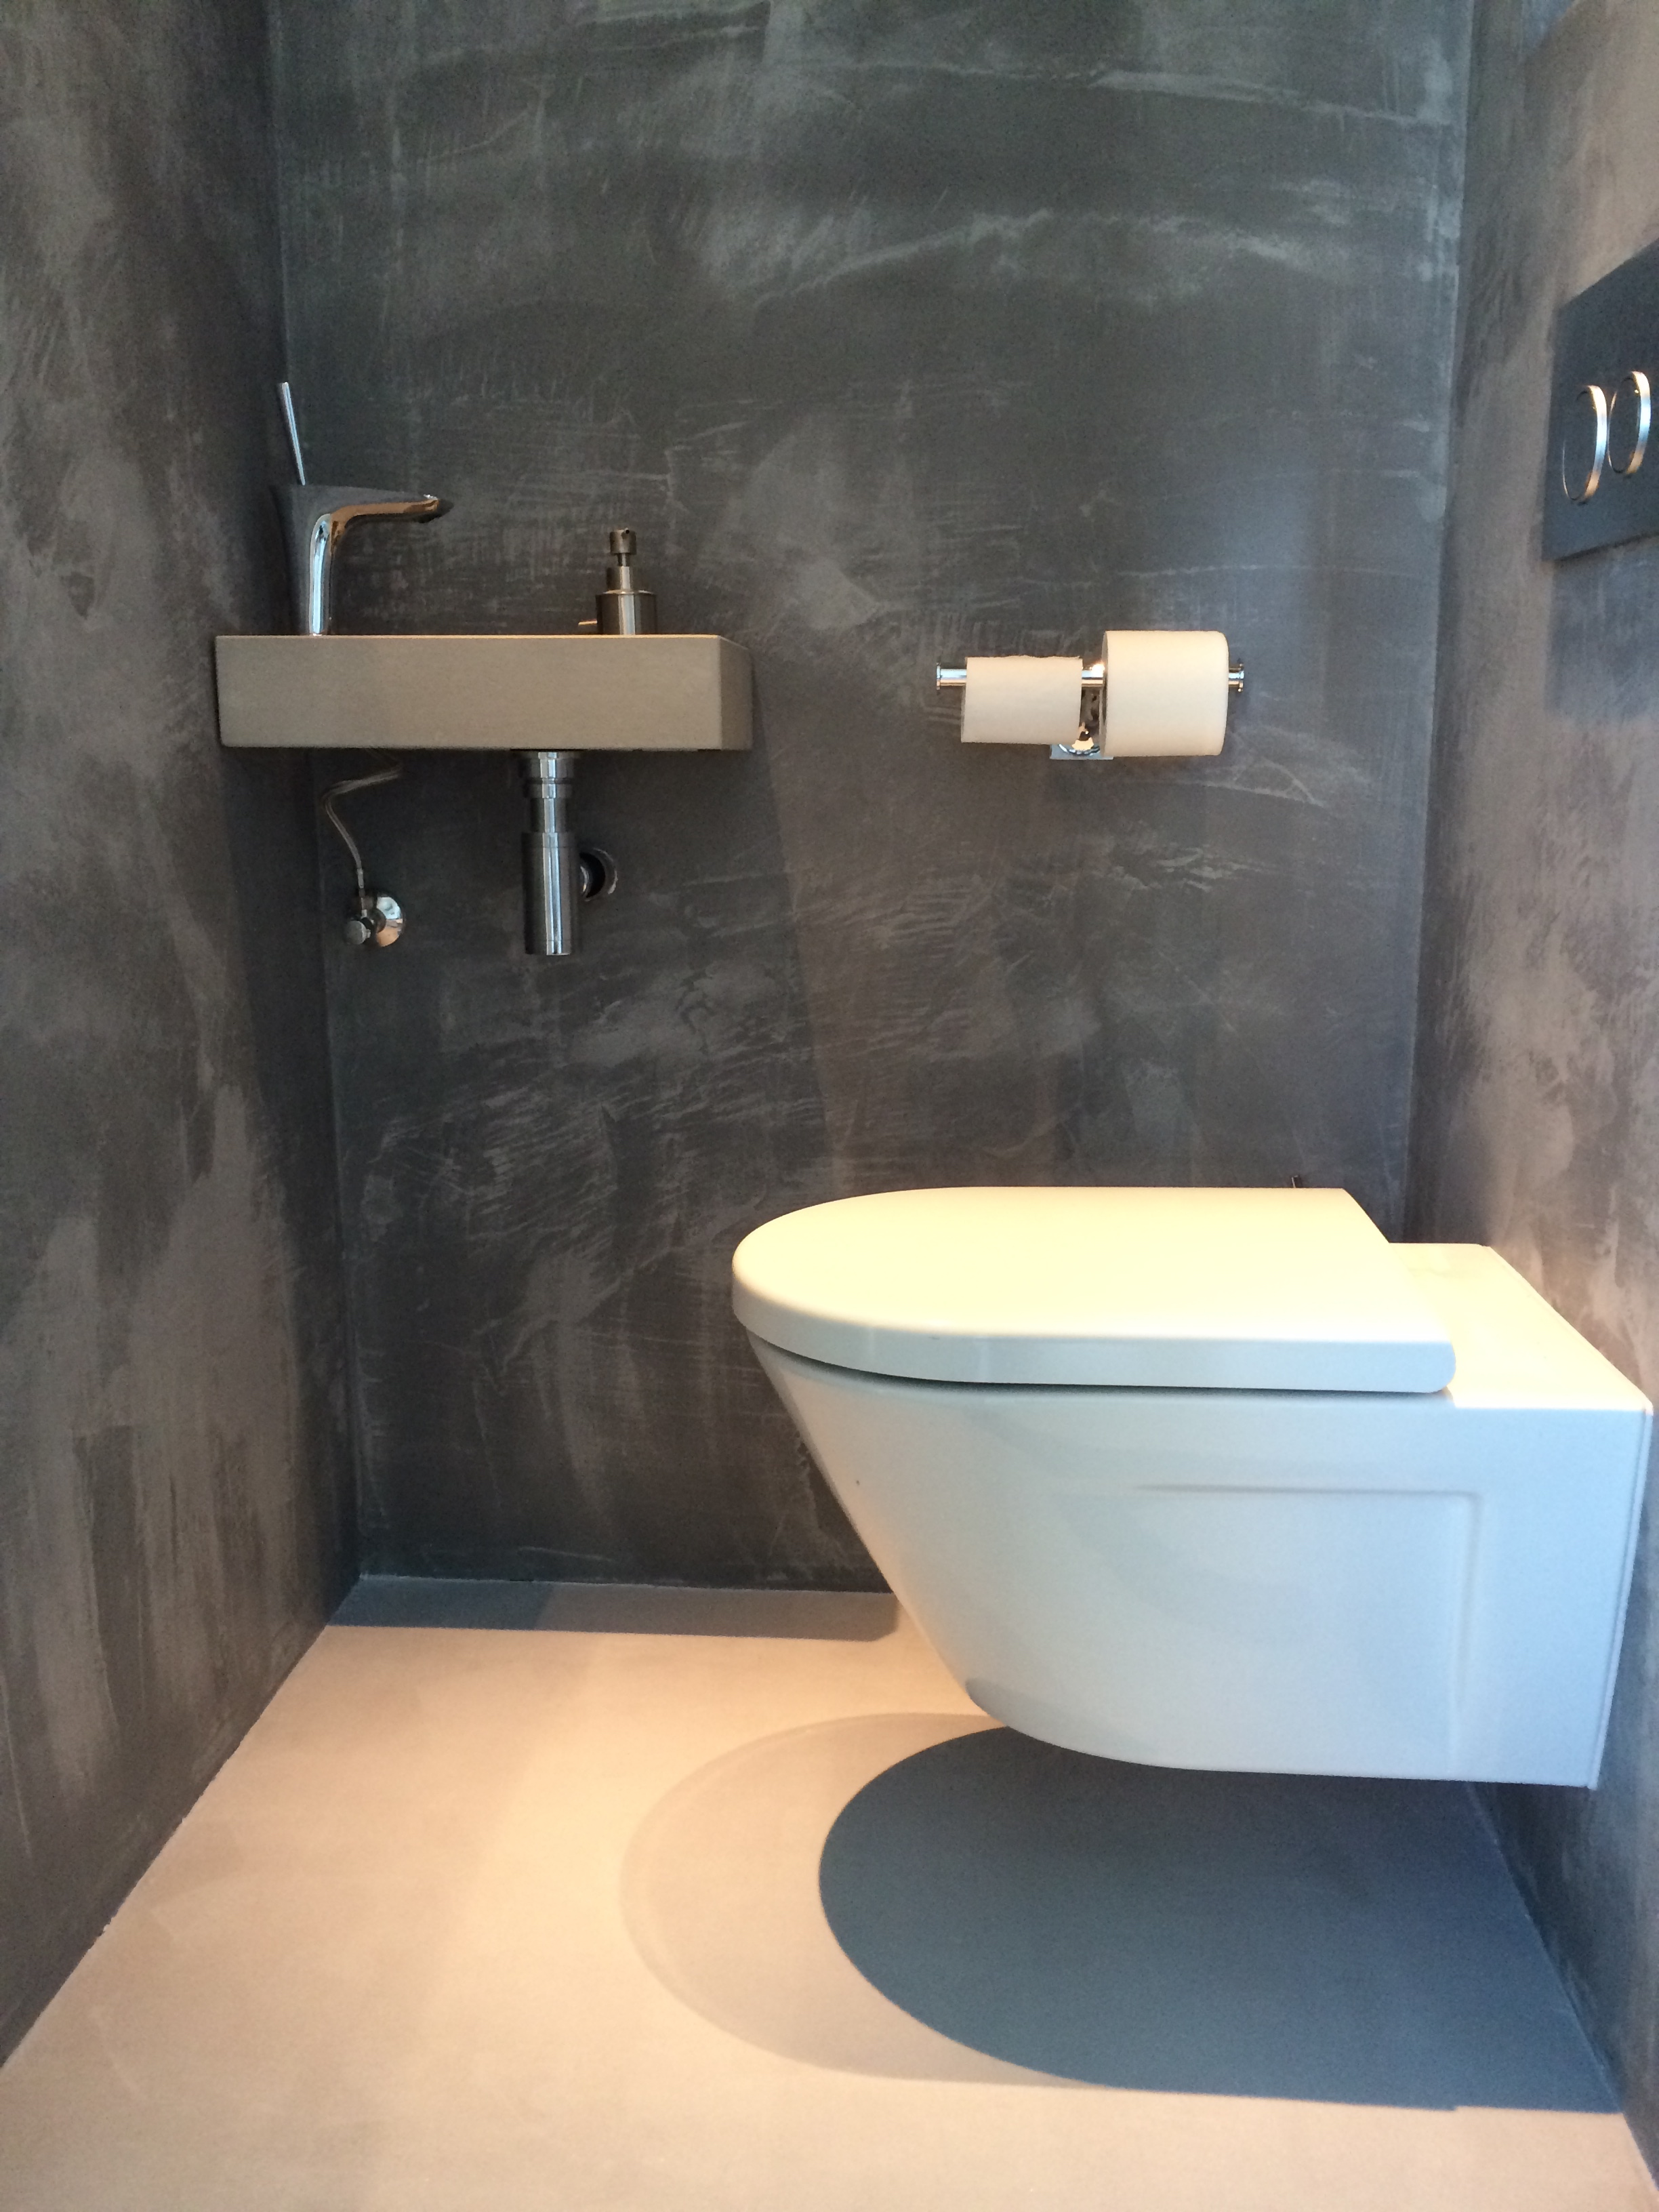 Toilettes carrelage mural and conception de toilette on - Carrelage toilette mural ...